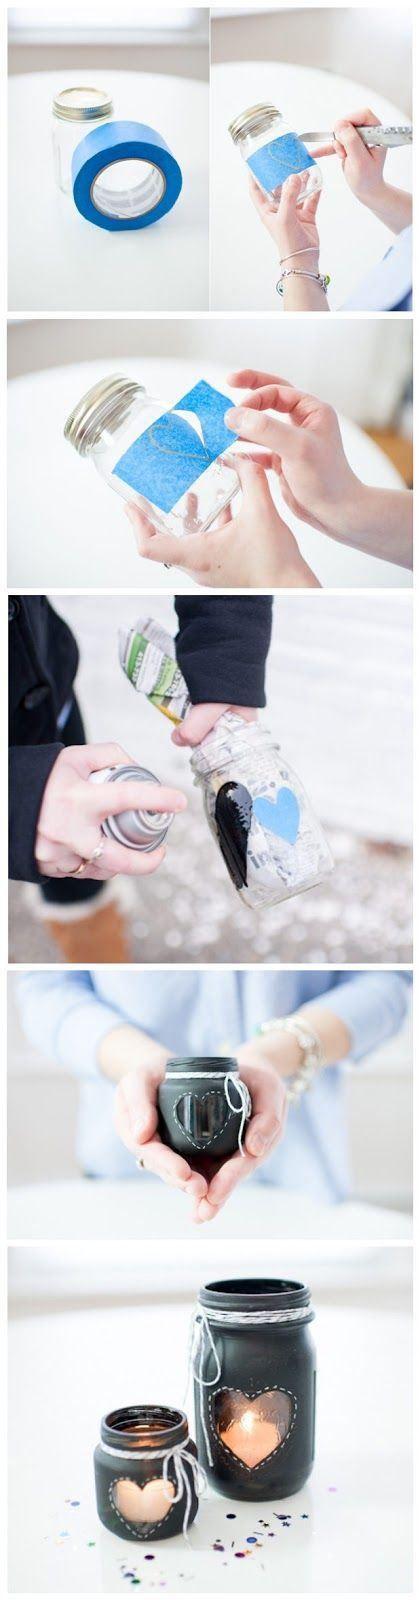 I want to do this so bad! I've got lots of jars just waiting. :)